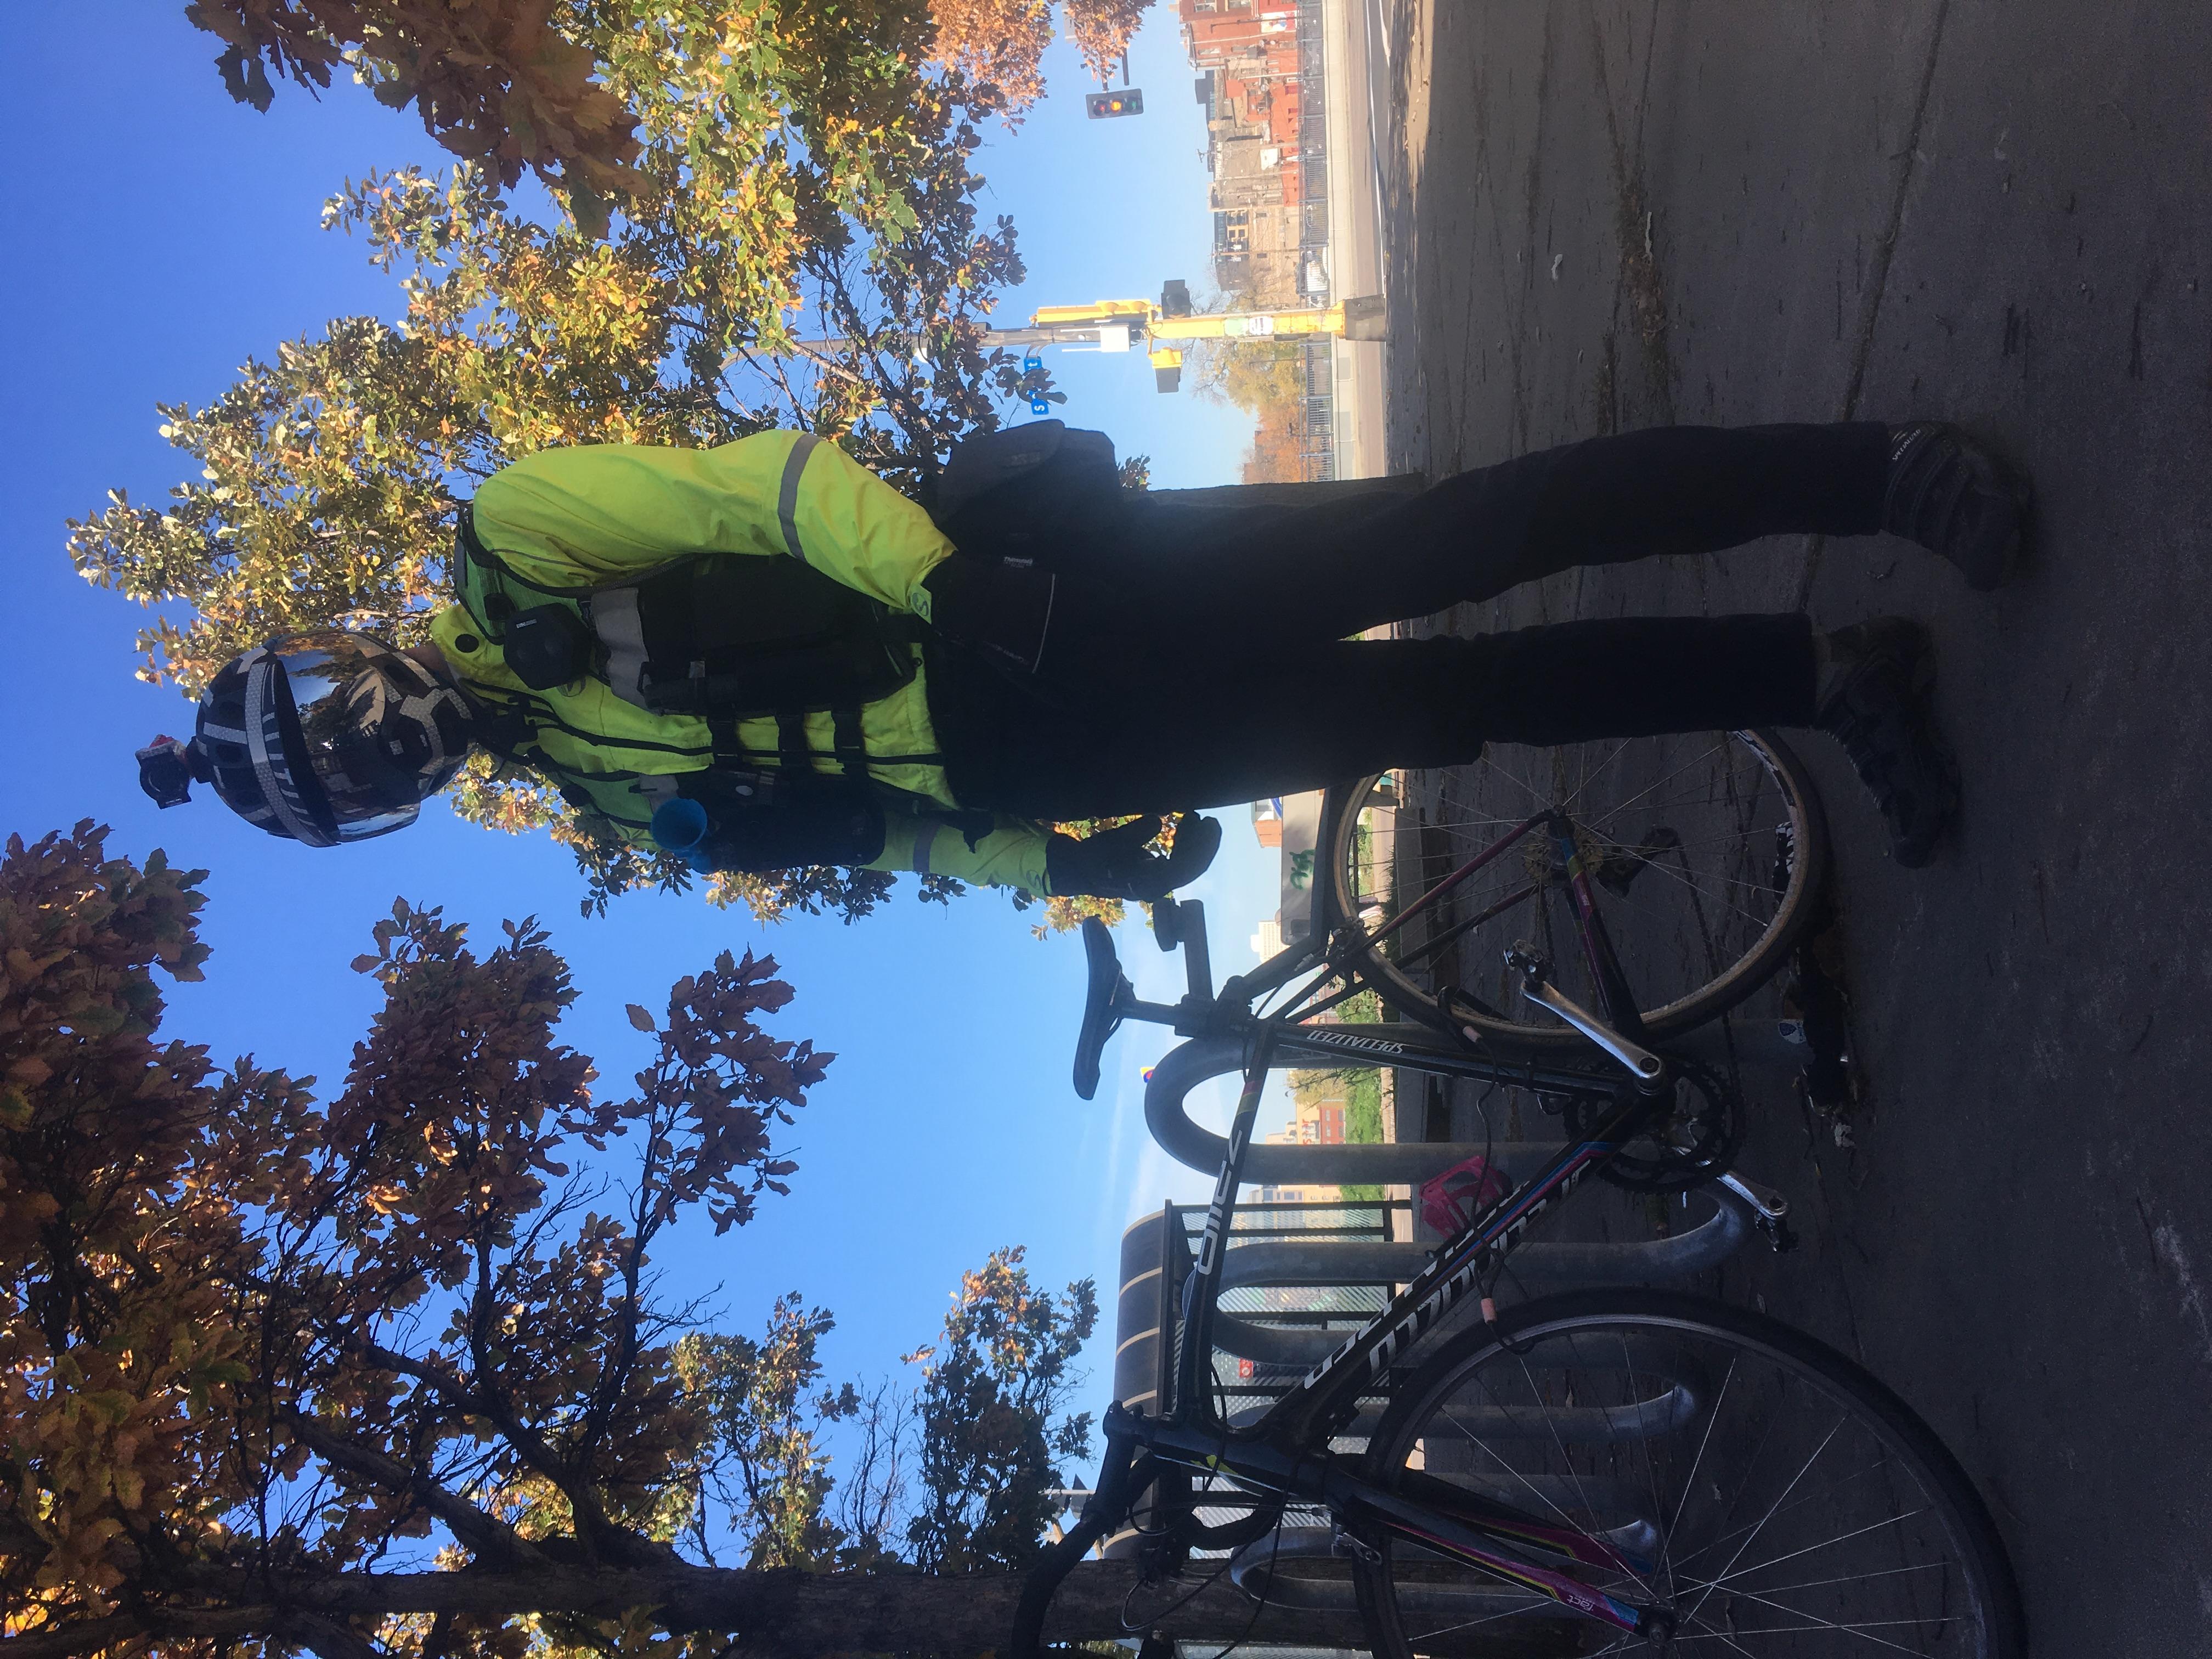 Bike Culture Gets Its Knight